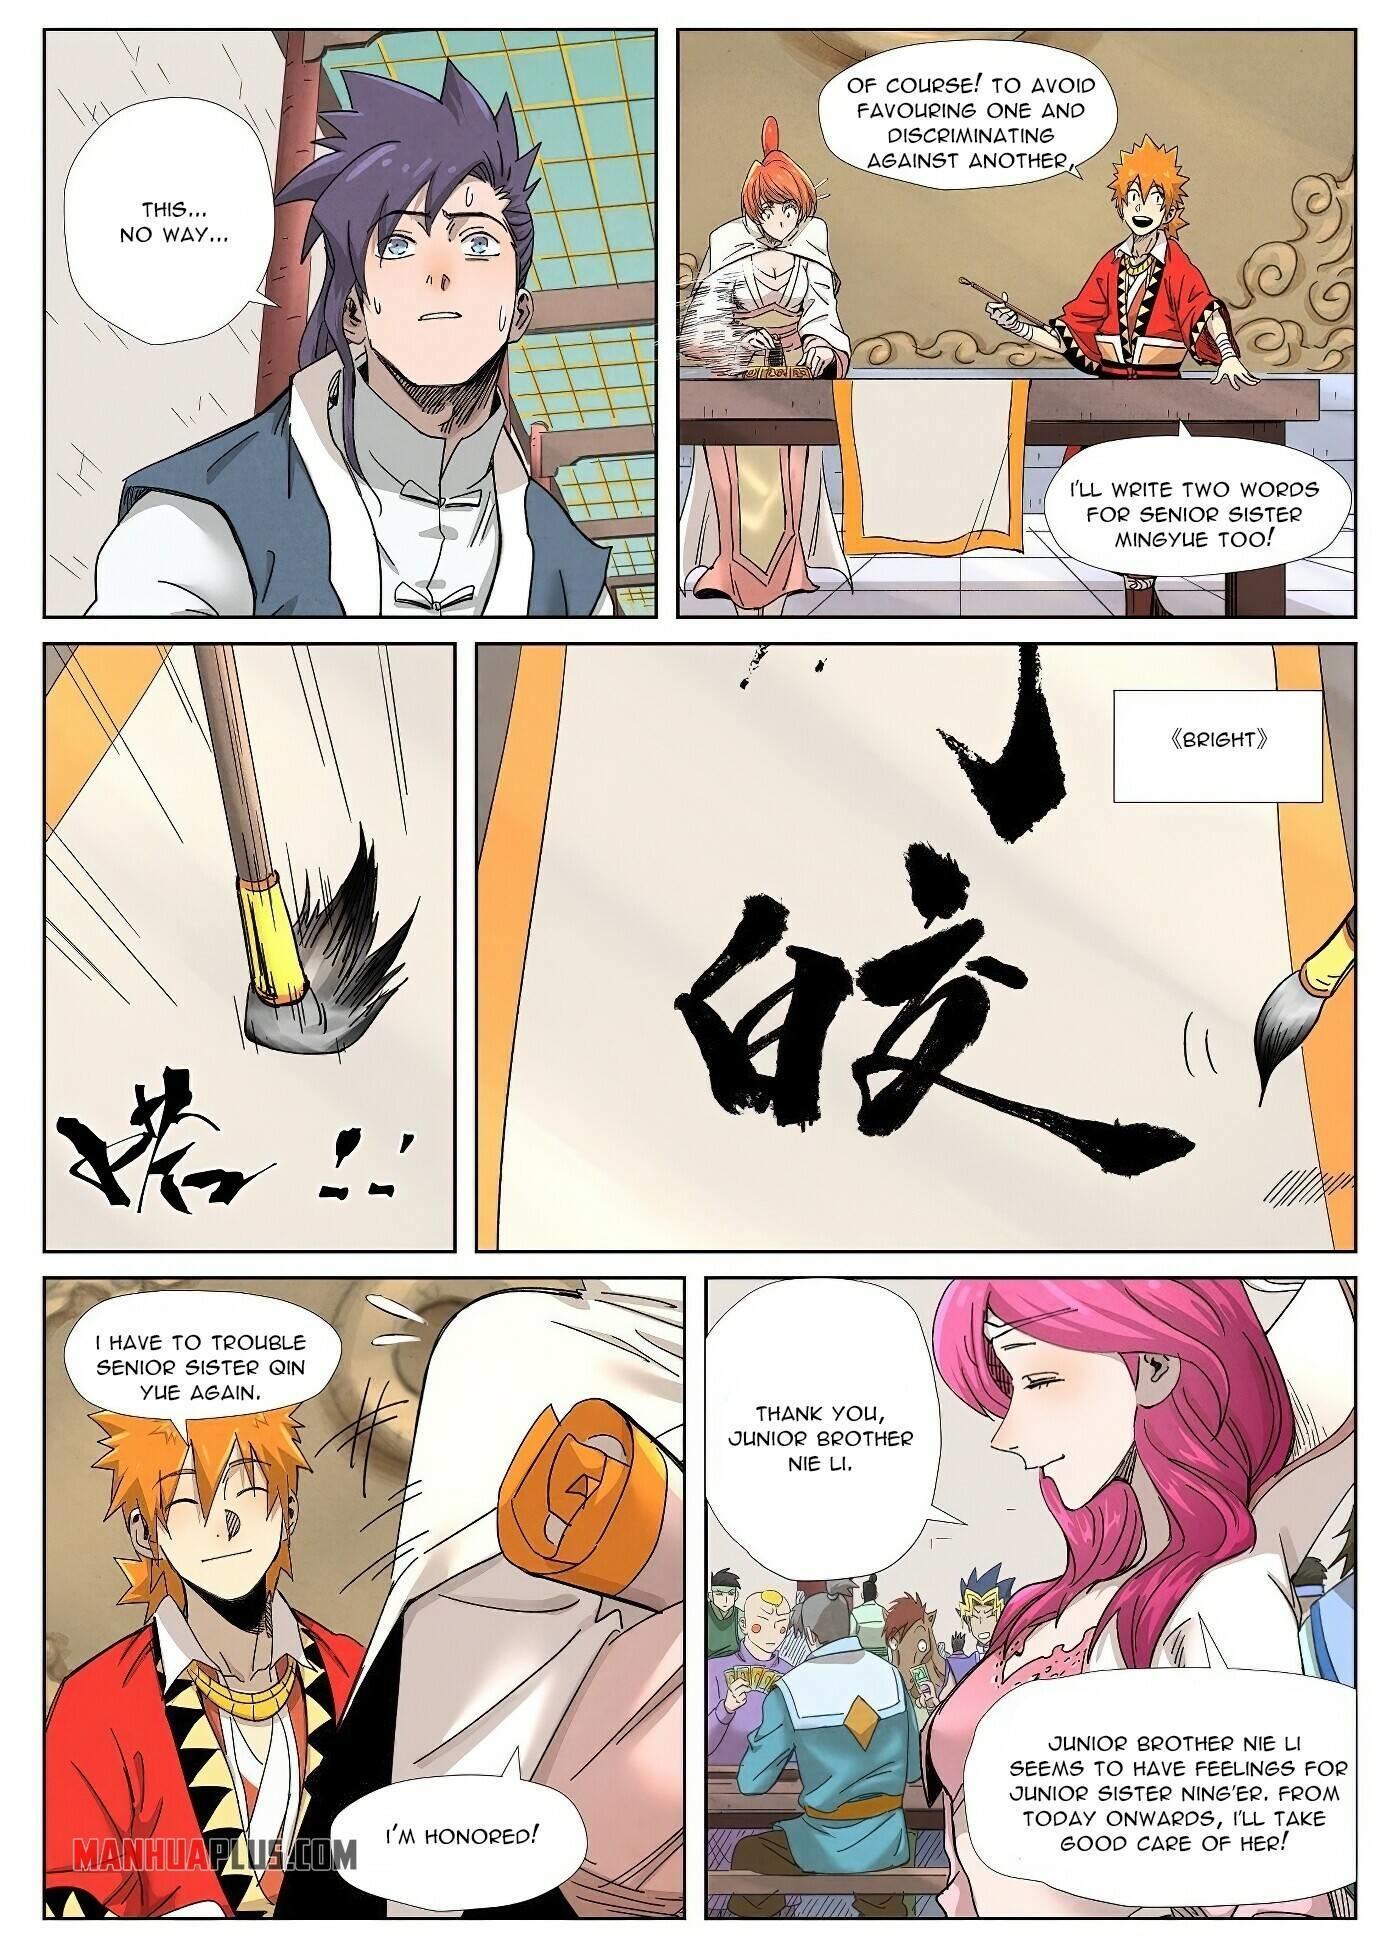 Tales Of Demons And Gods Chapter 342 page 9 - Mangakakalot